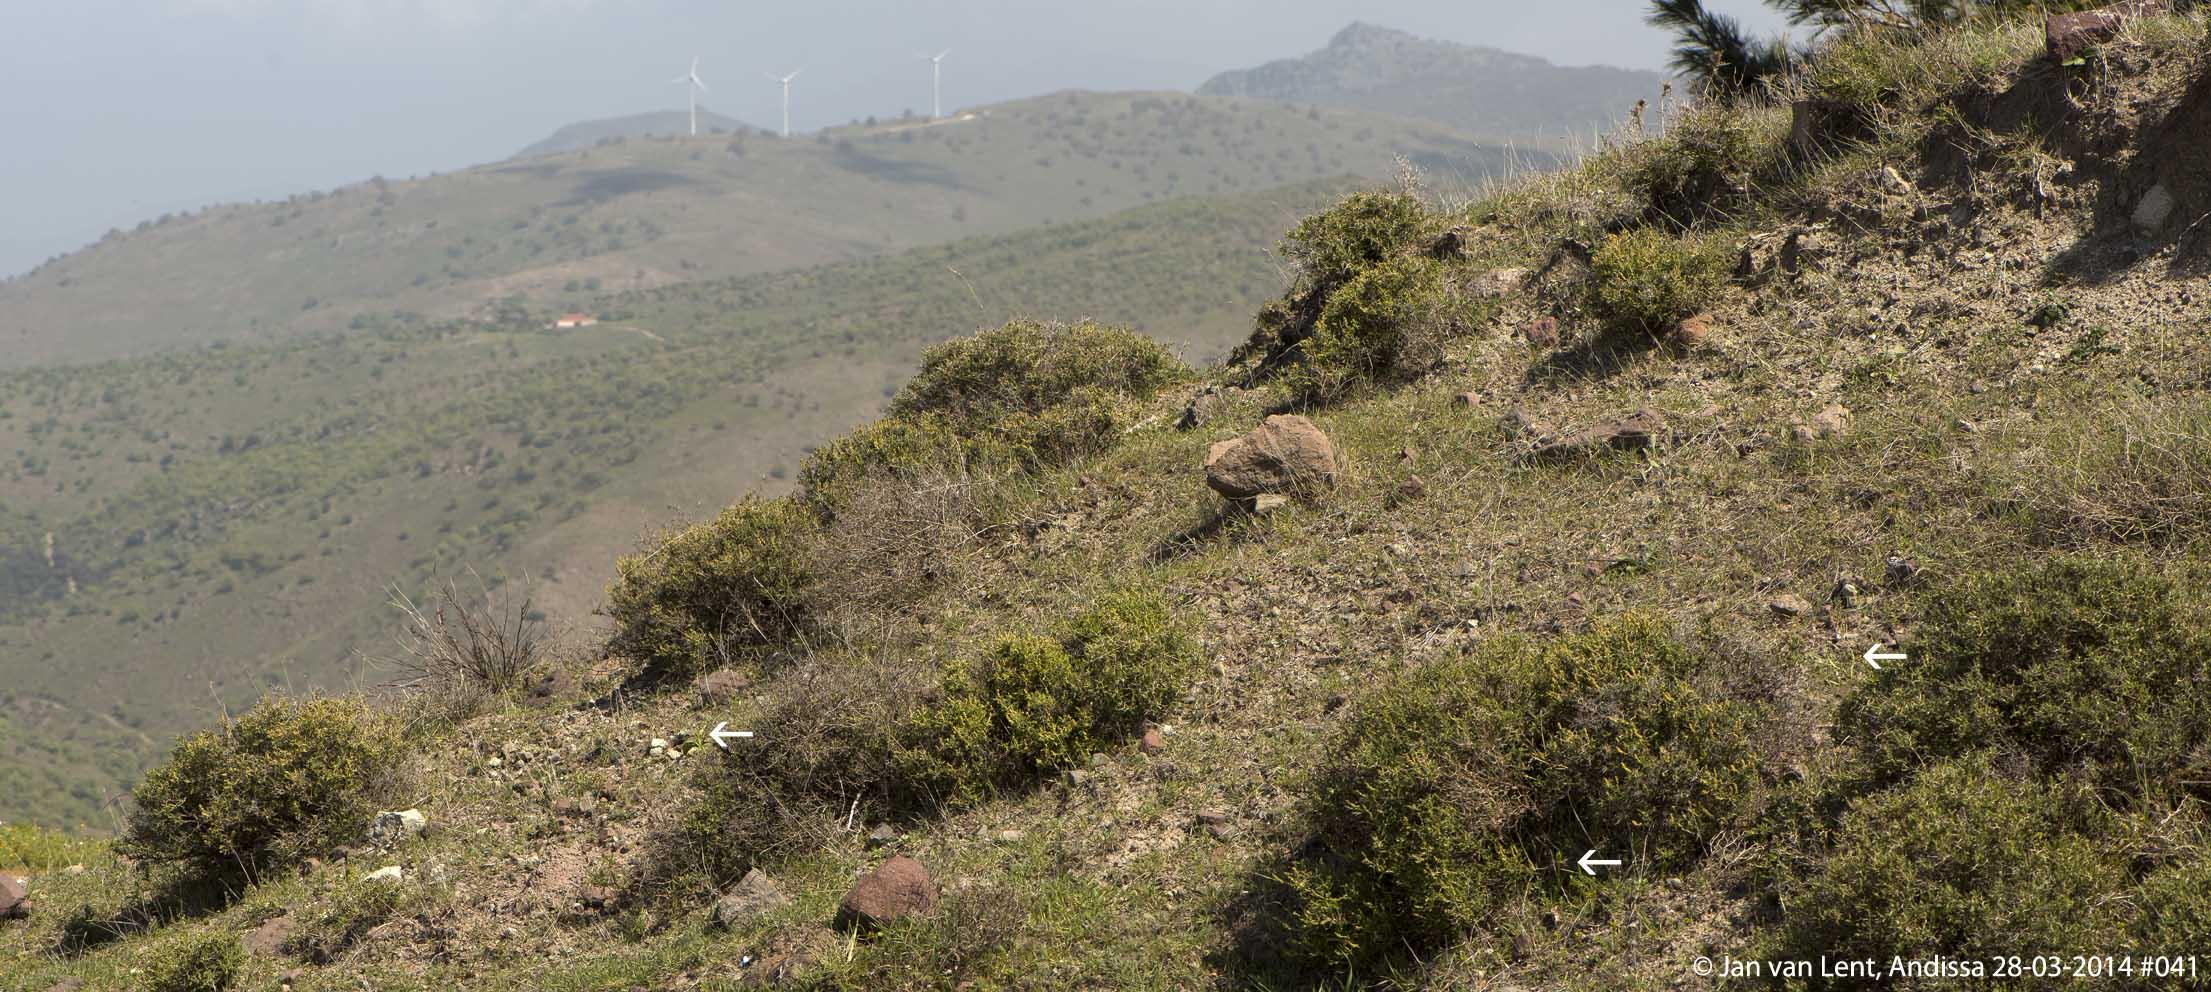 Habitat Andissa © Jan van Lent 28-03-2014 #041.